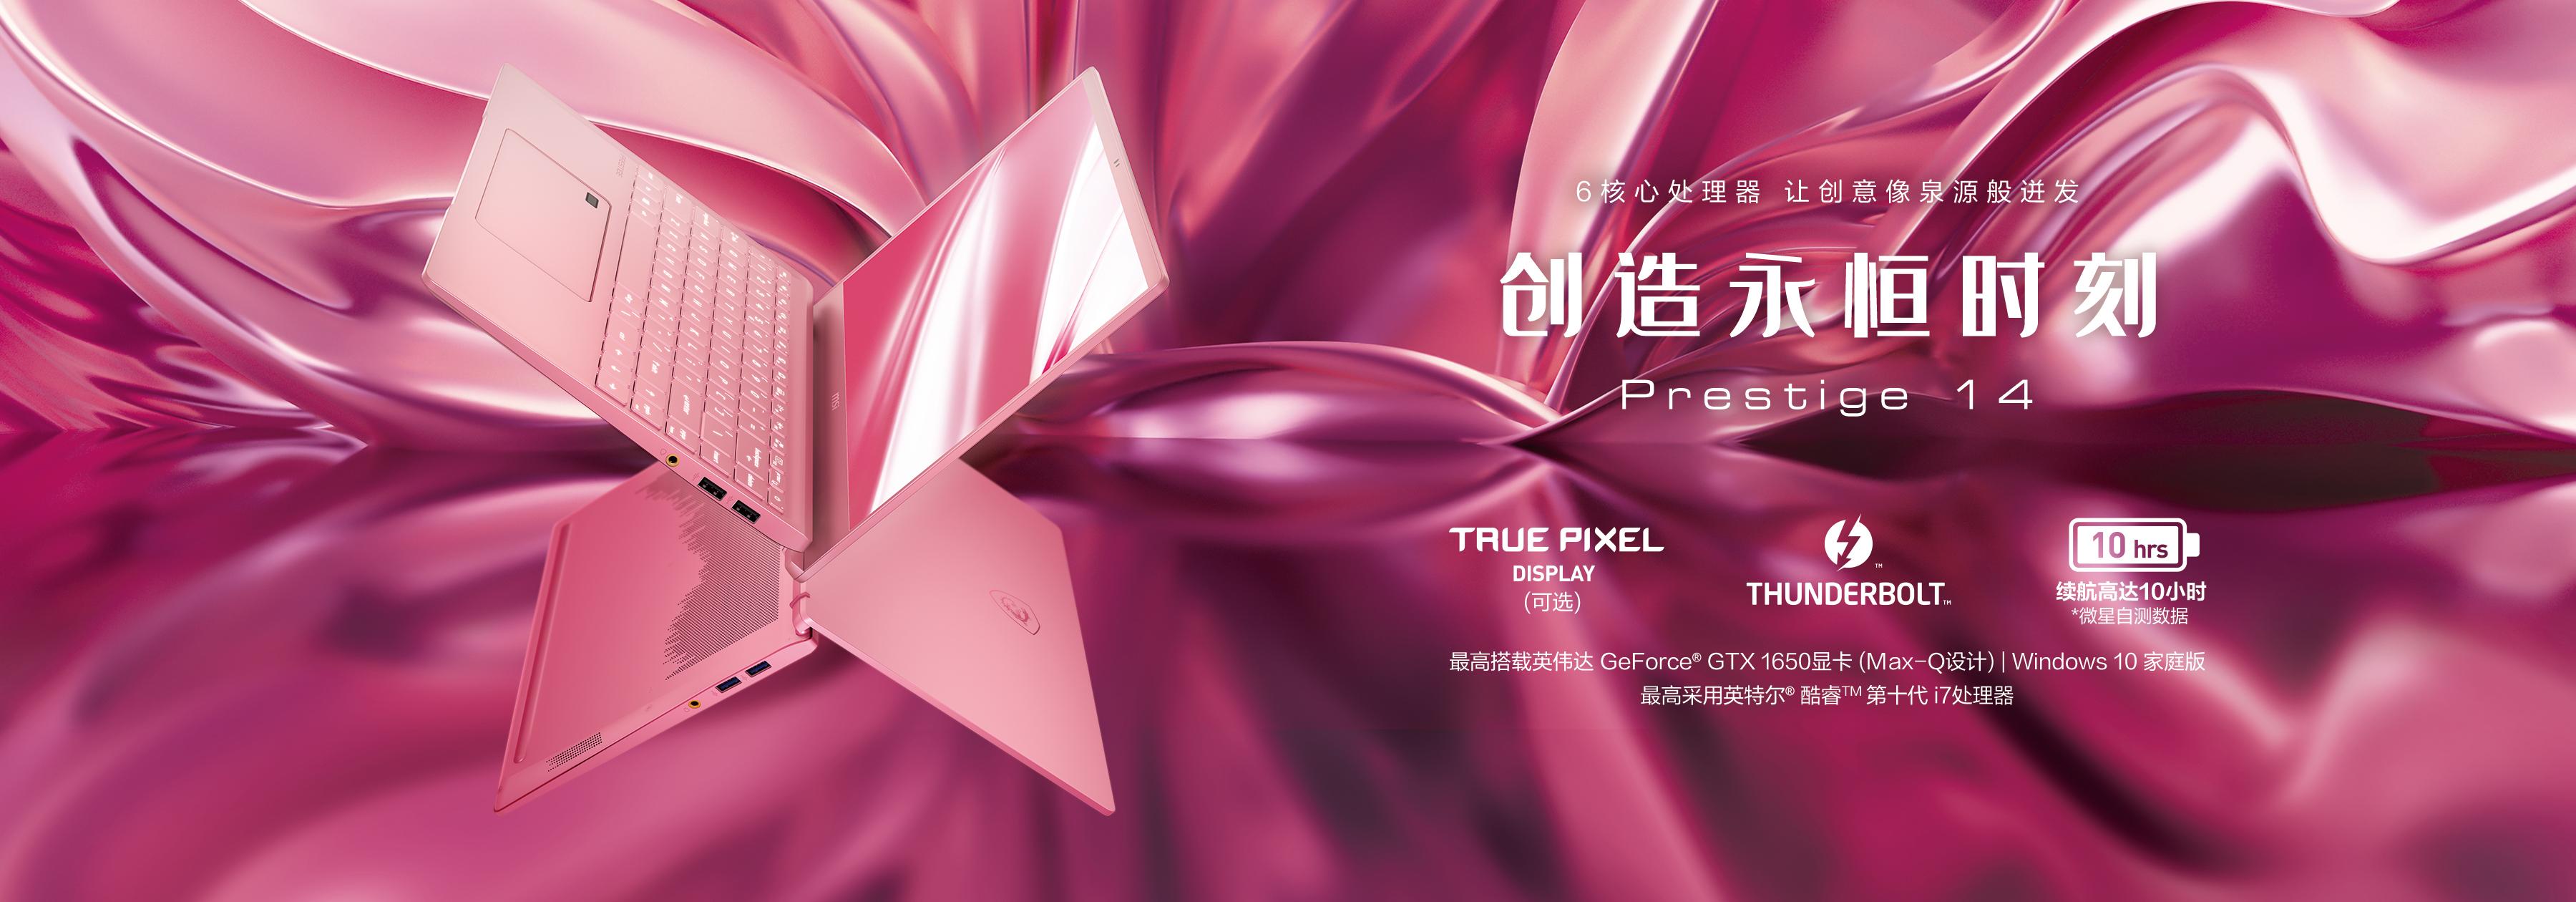 prestige pink